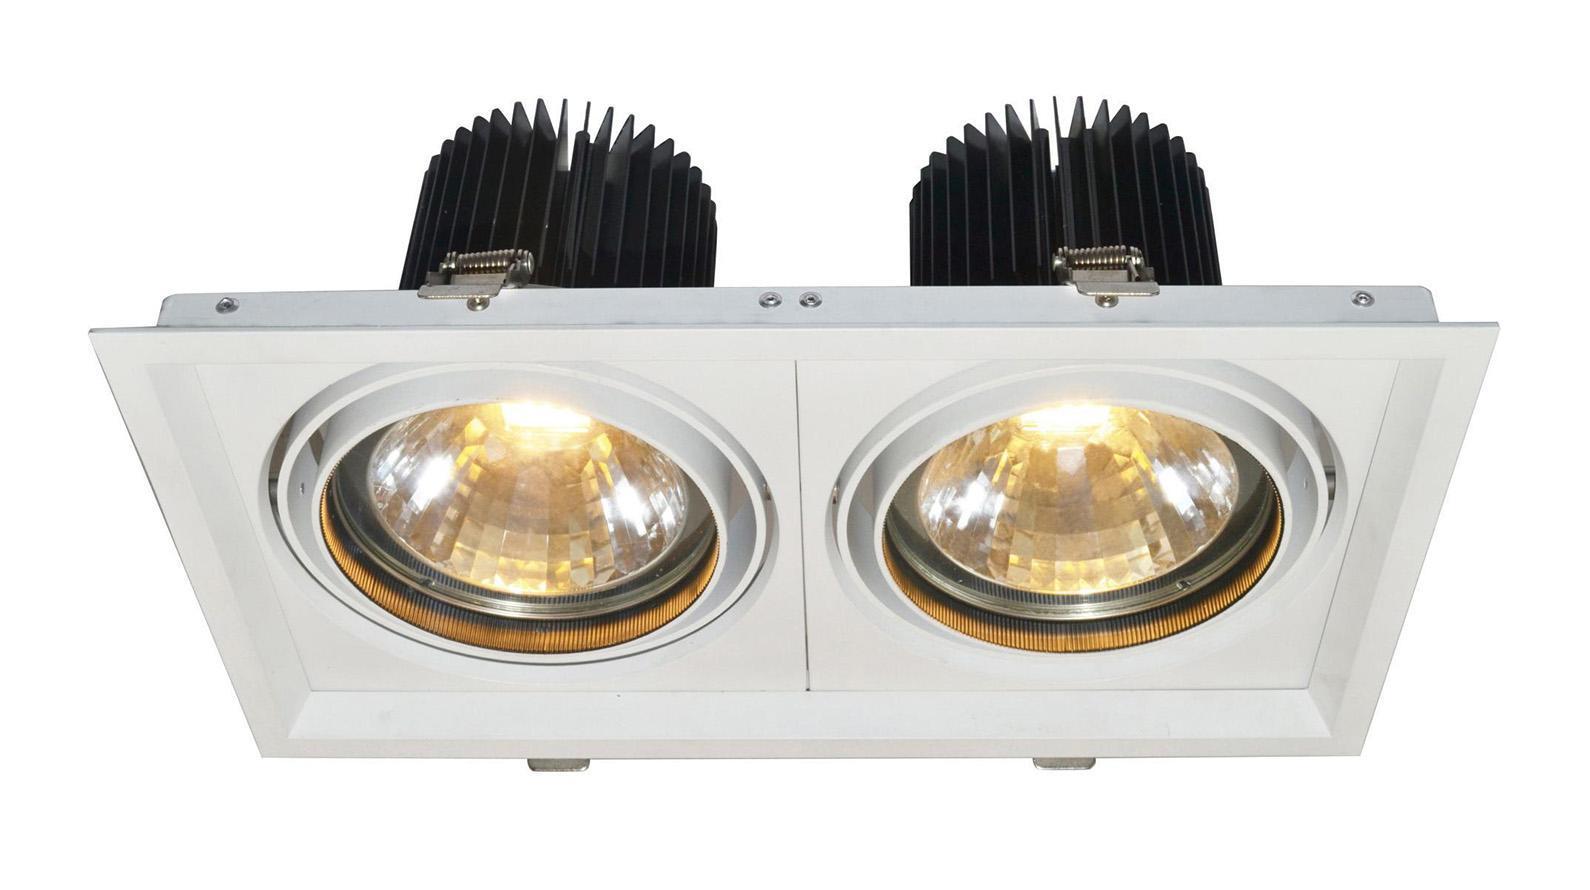 A2134PL-2WH MISSILE Встраиваемый светильникA2134PL-2WH2x30W LED; 2x2400 lm Материал: Арматура: Алюминий / Элемент декора: СтеклоРазмер: 190x350x150Цвет: Белый